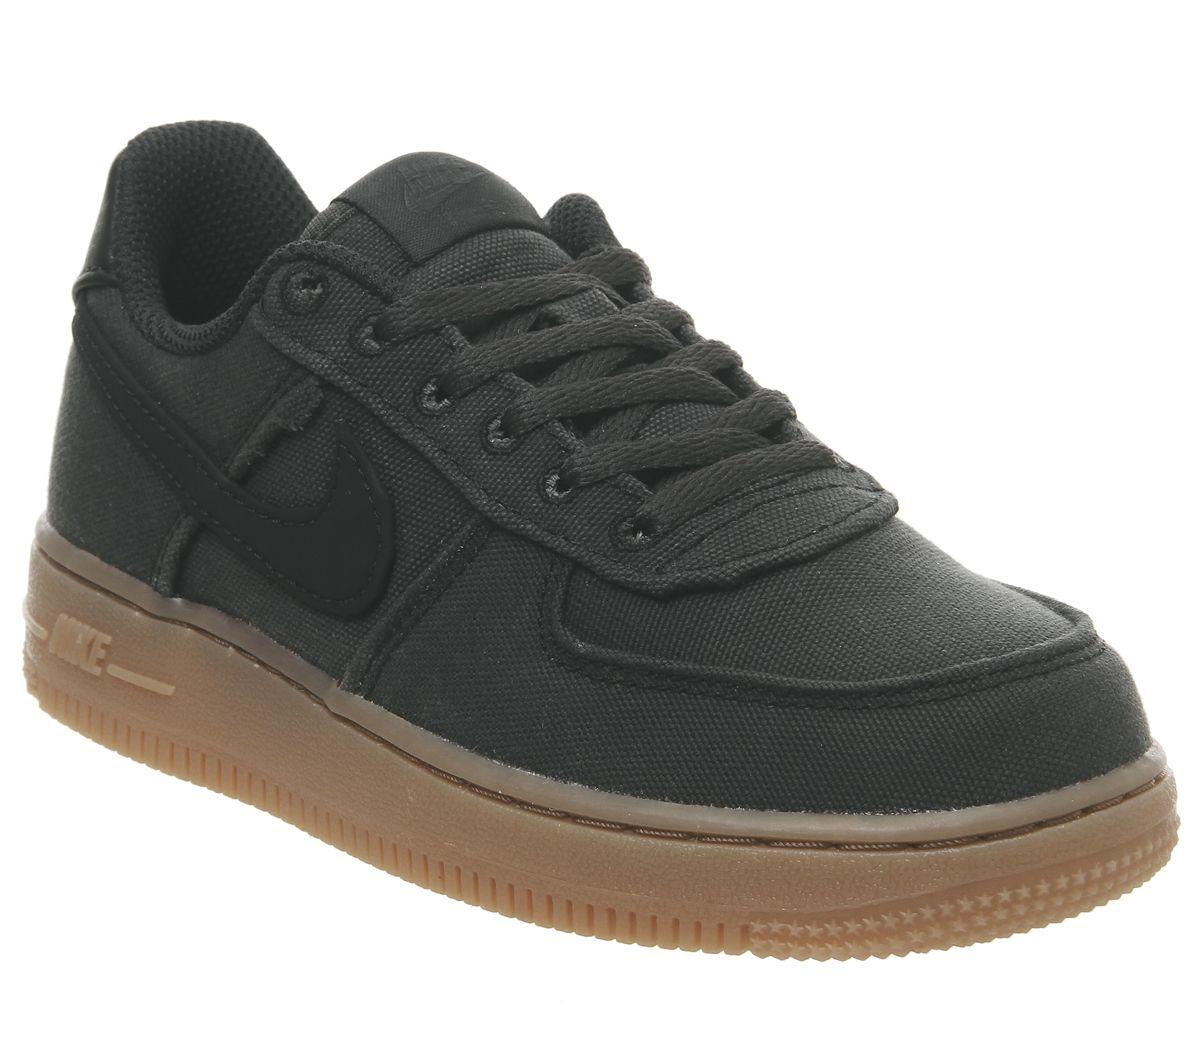 size 40 0a783 dcc68 Nike Air Force 1 Ps Trainers Black Black Gum Lv8 - Unisex